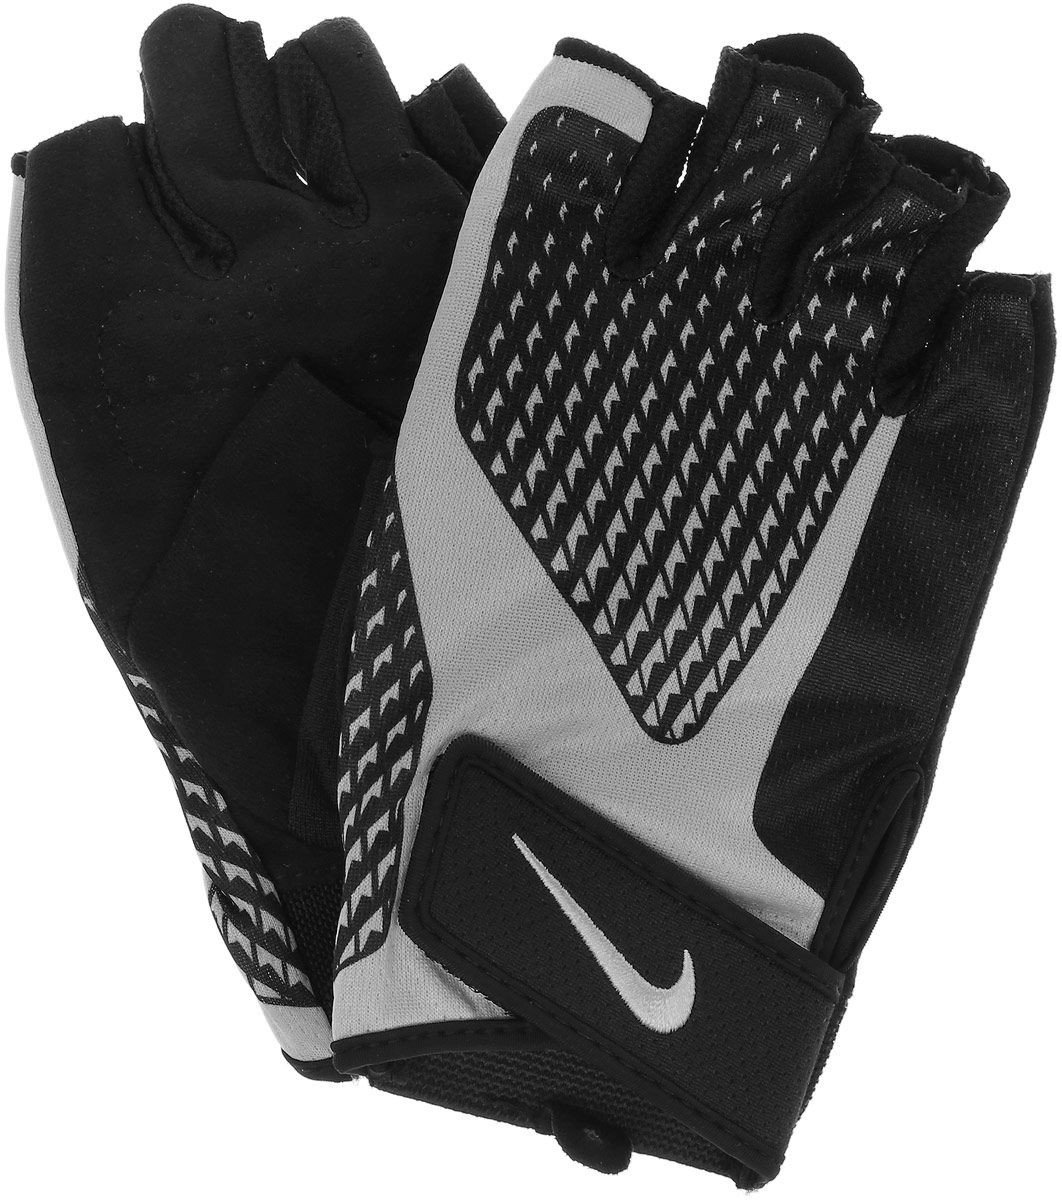 Мужские перчатки для зала Nike, цвет: черный, светло-серый. Размер S